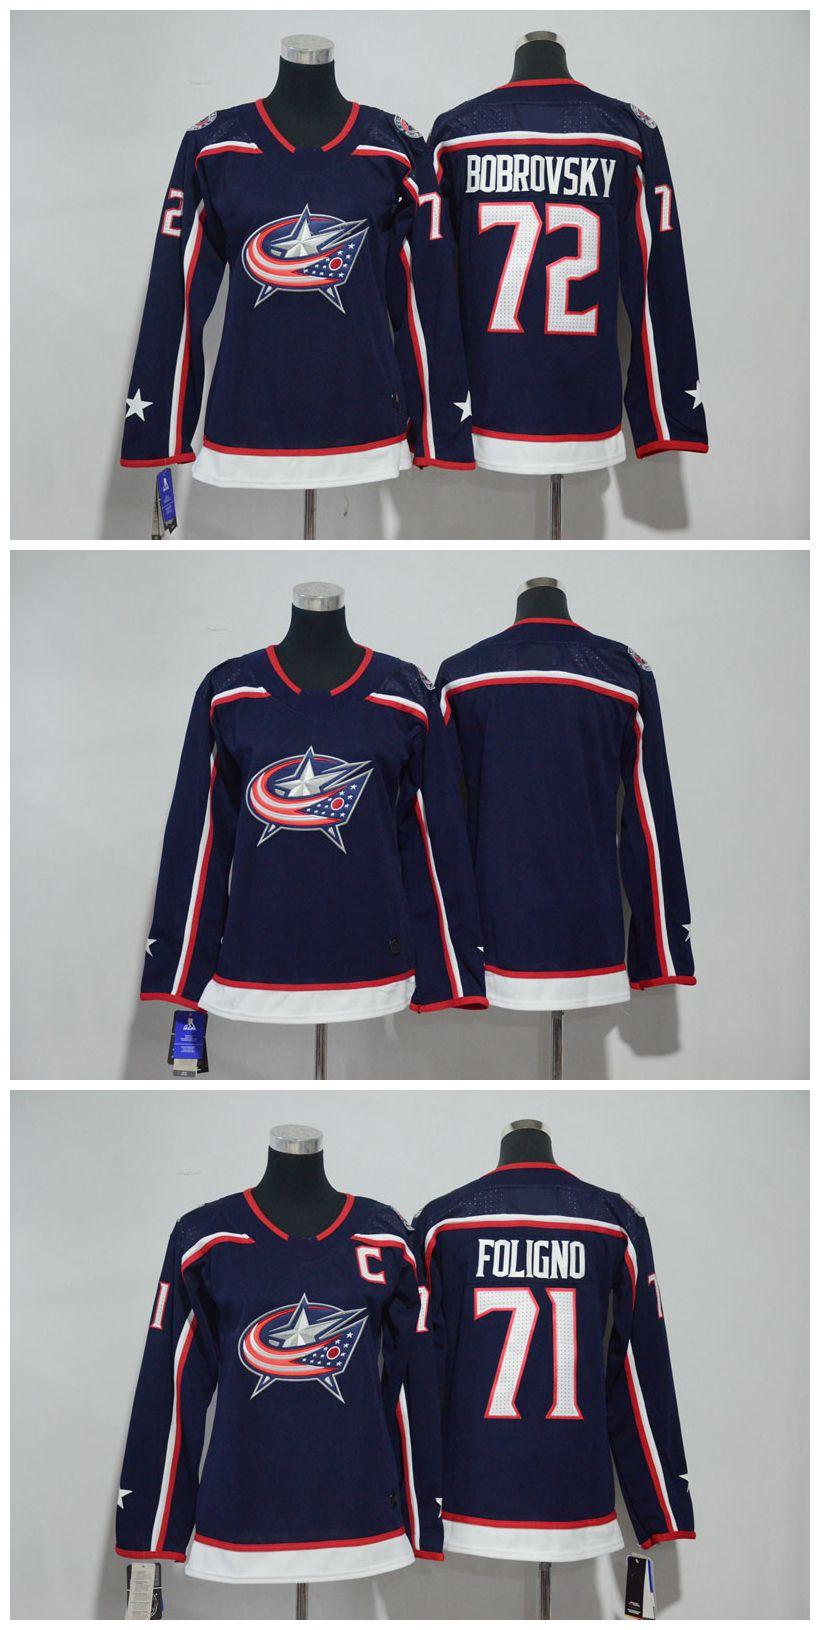 2018 Women Columbus Blue Jackets Jersey 71 Nick Foligno 72 Sergei Bobrovsky  Jersey Blank No Name Number Stitched Ladies Hockey Jerseys Edmonton Jerseys  ... 400a9e638